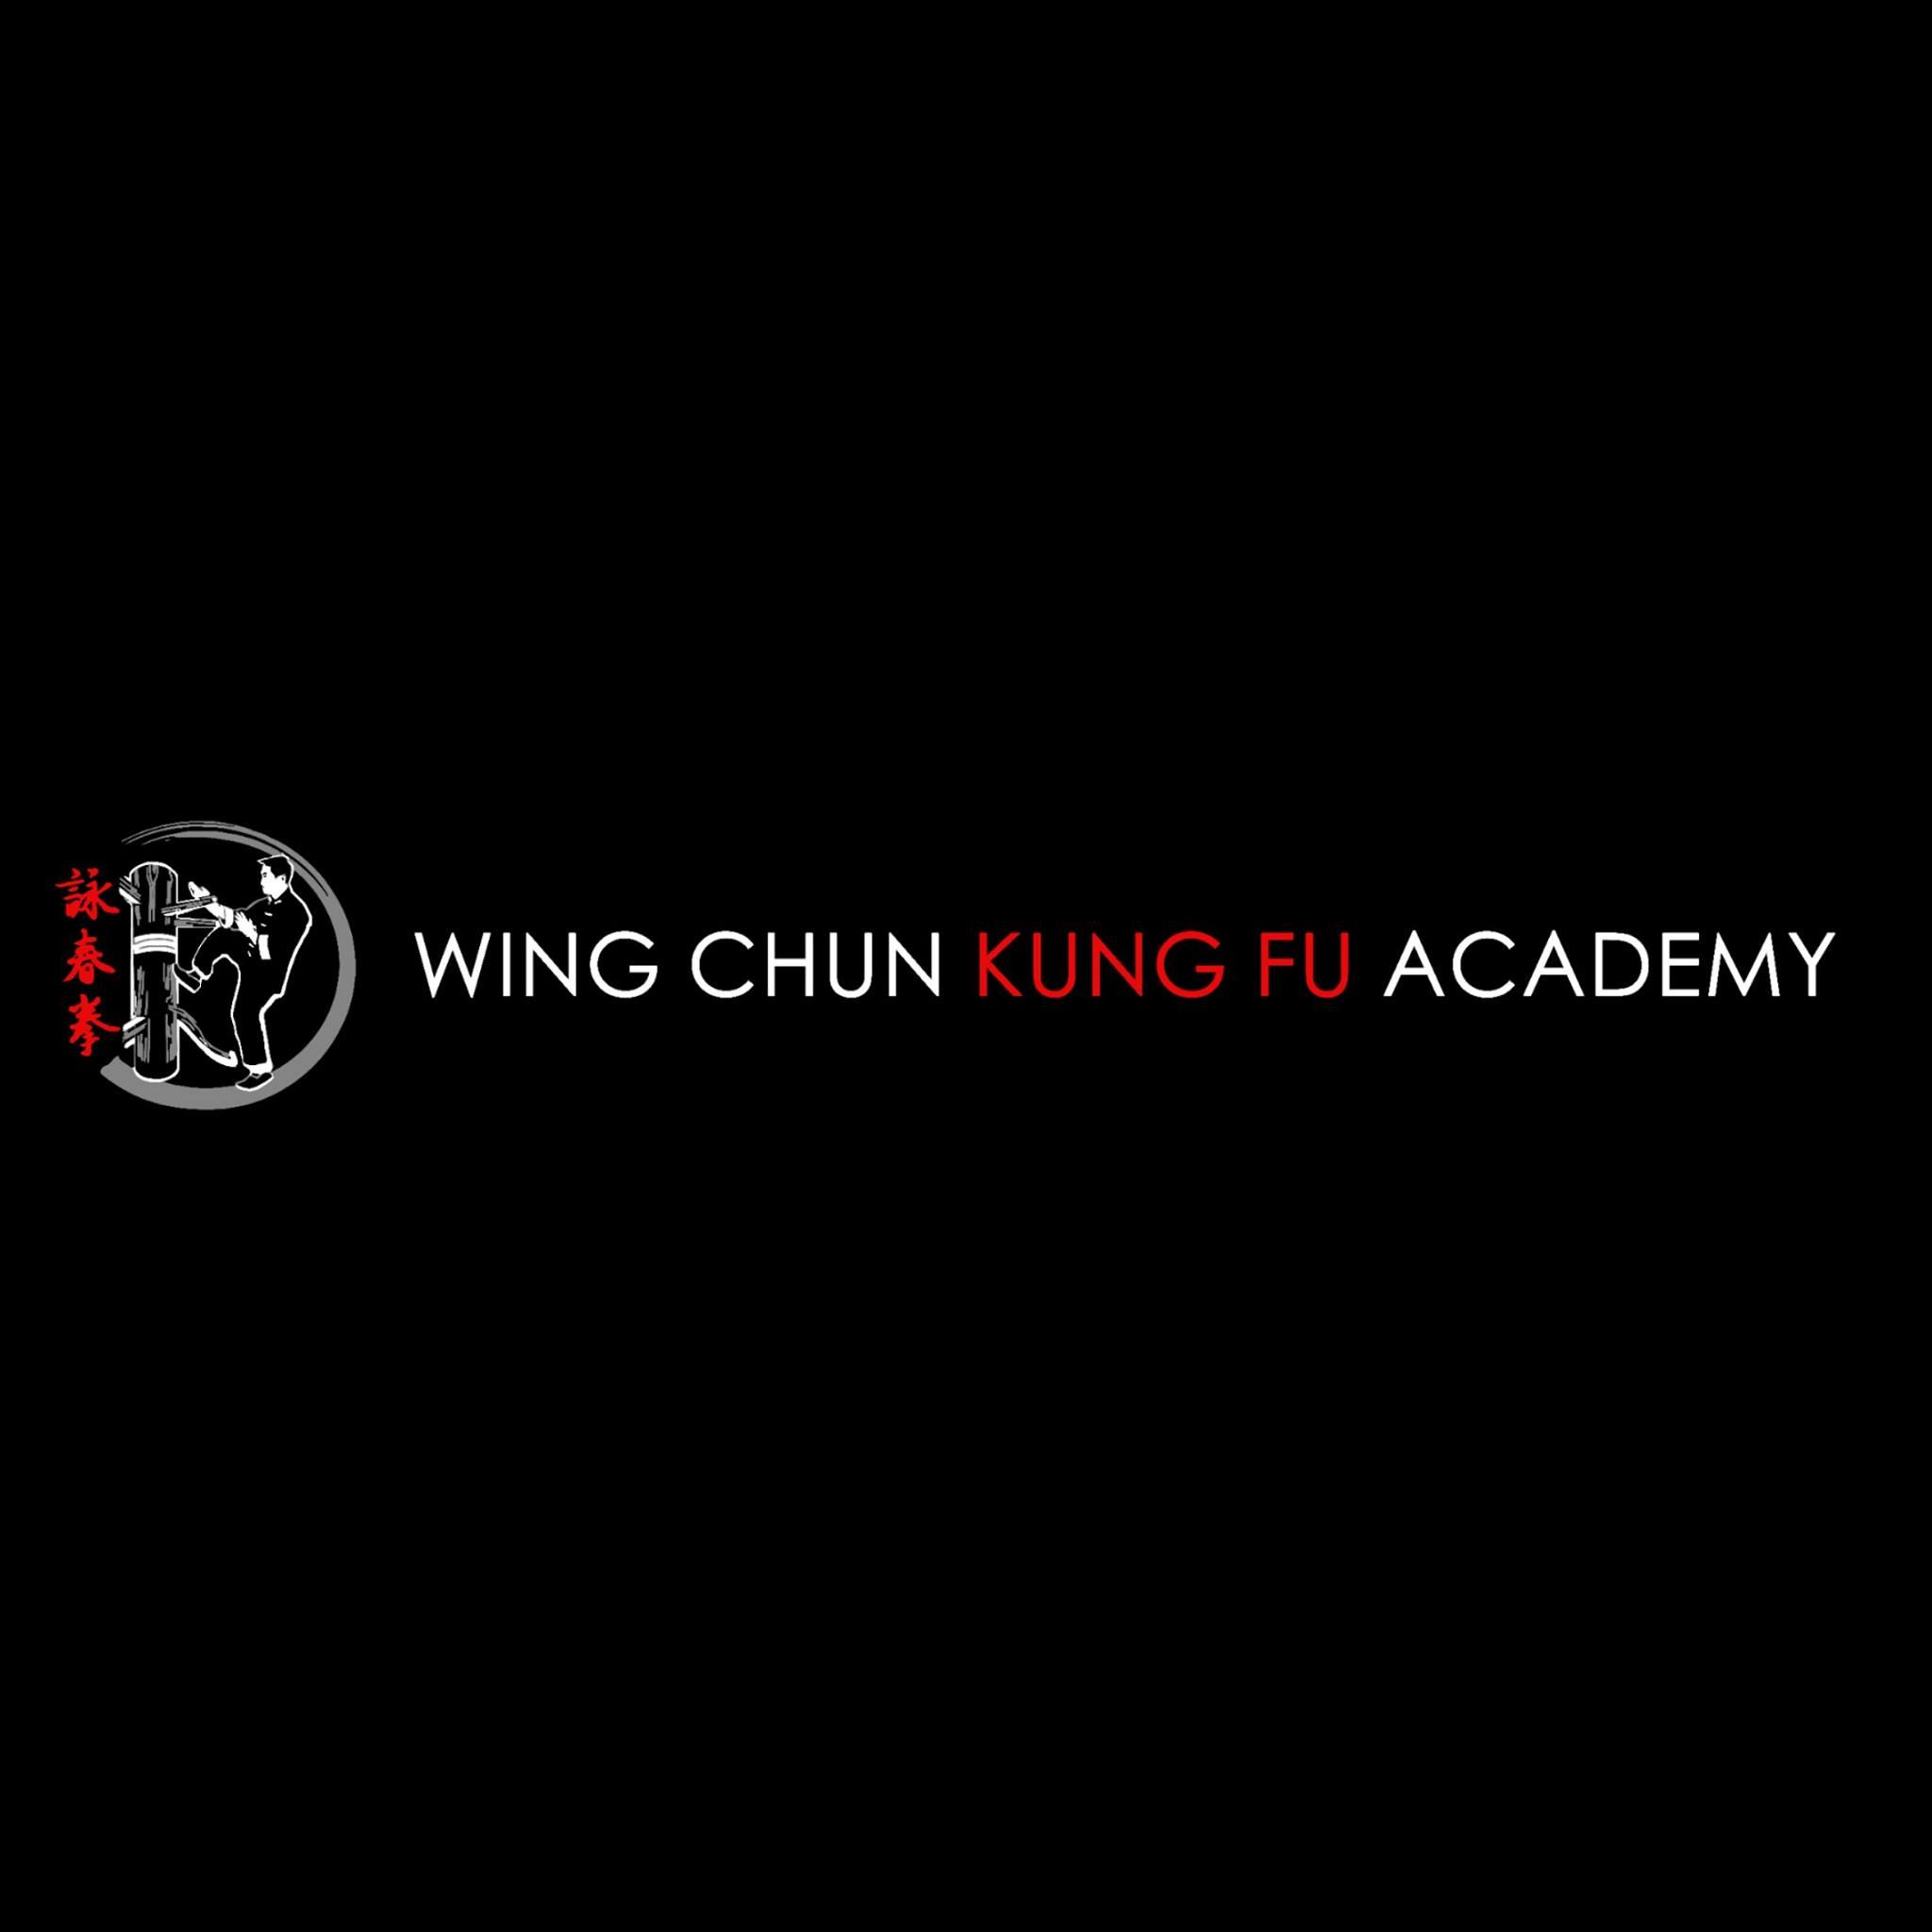 ASD Accademia Iwka